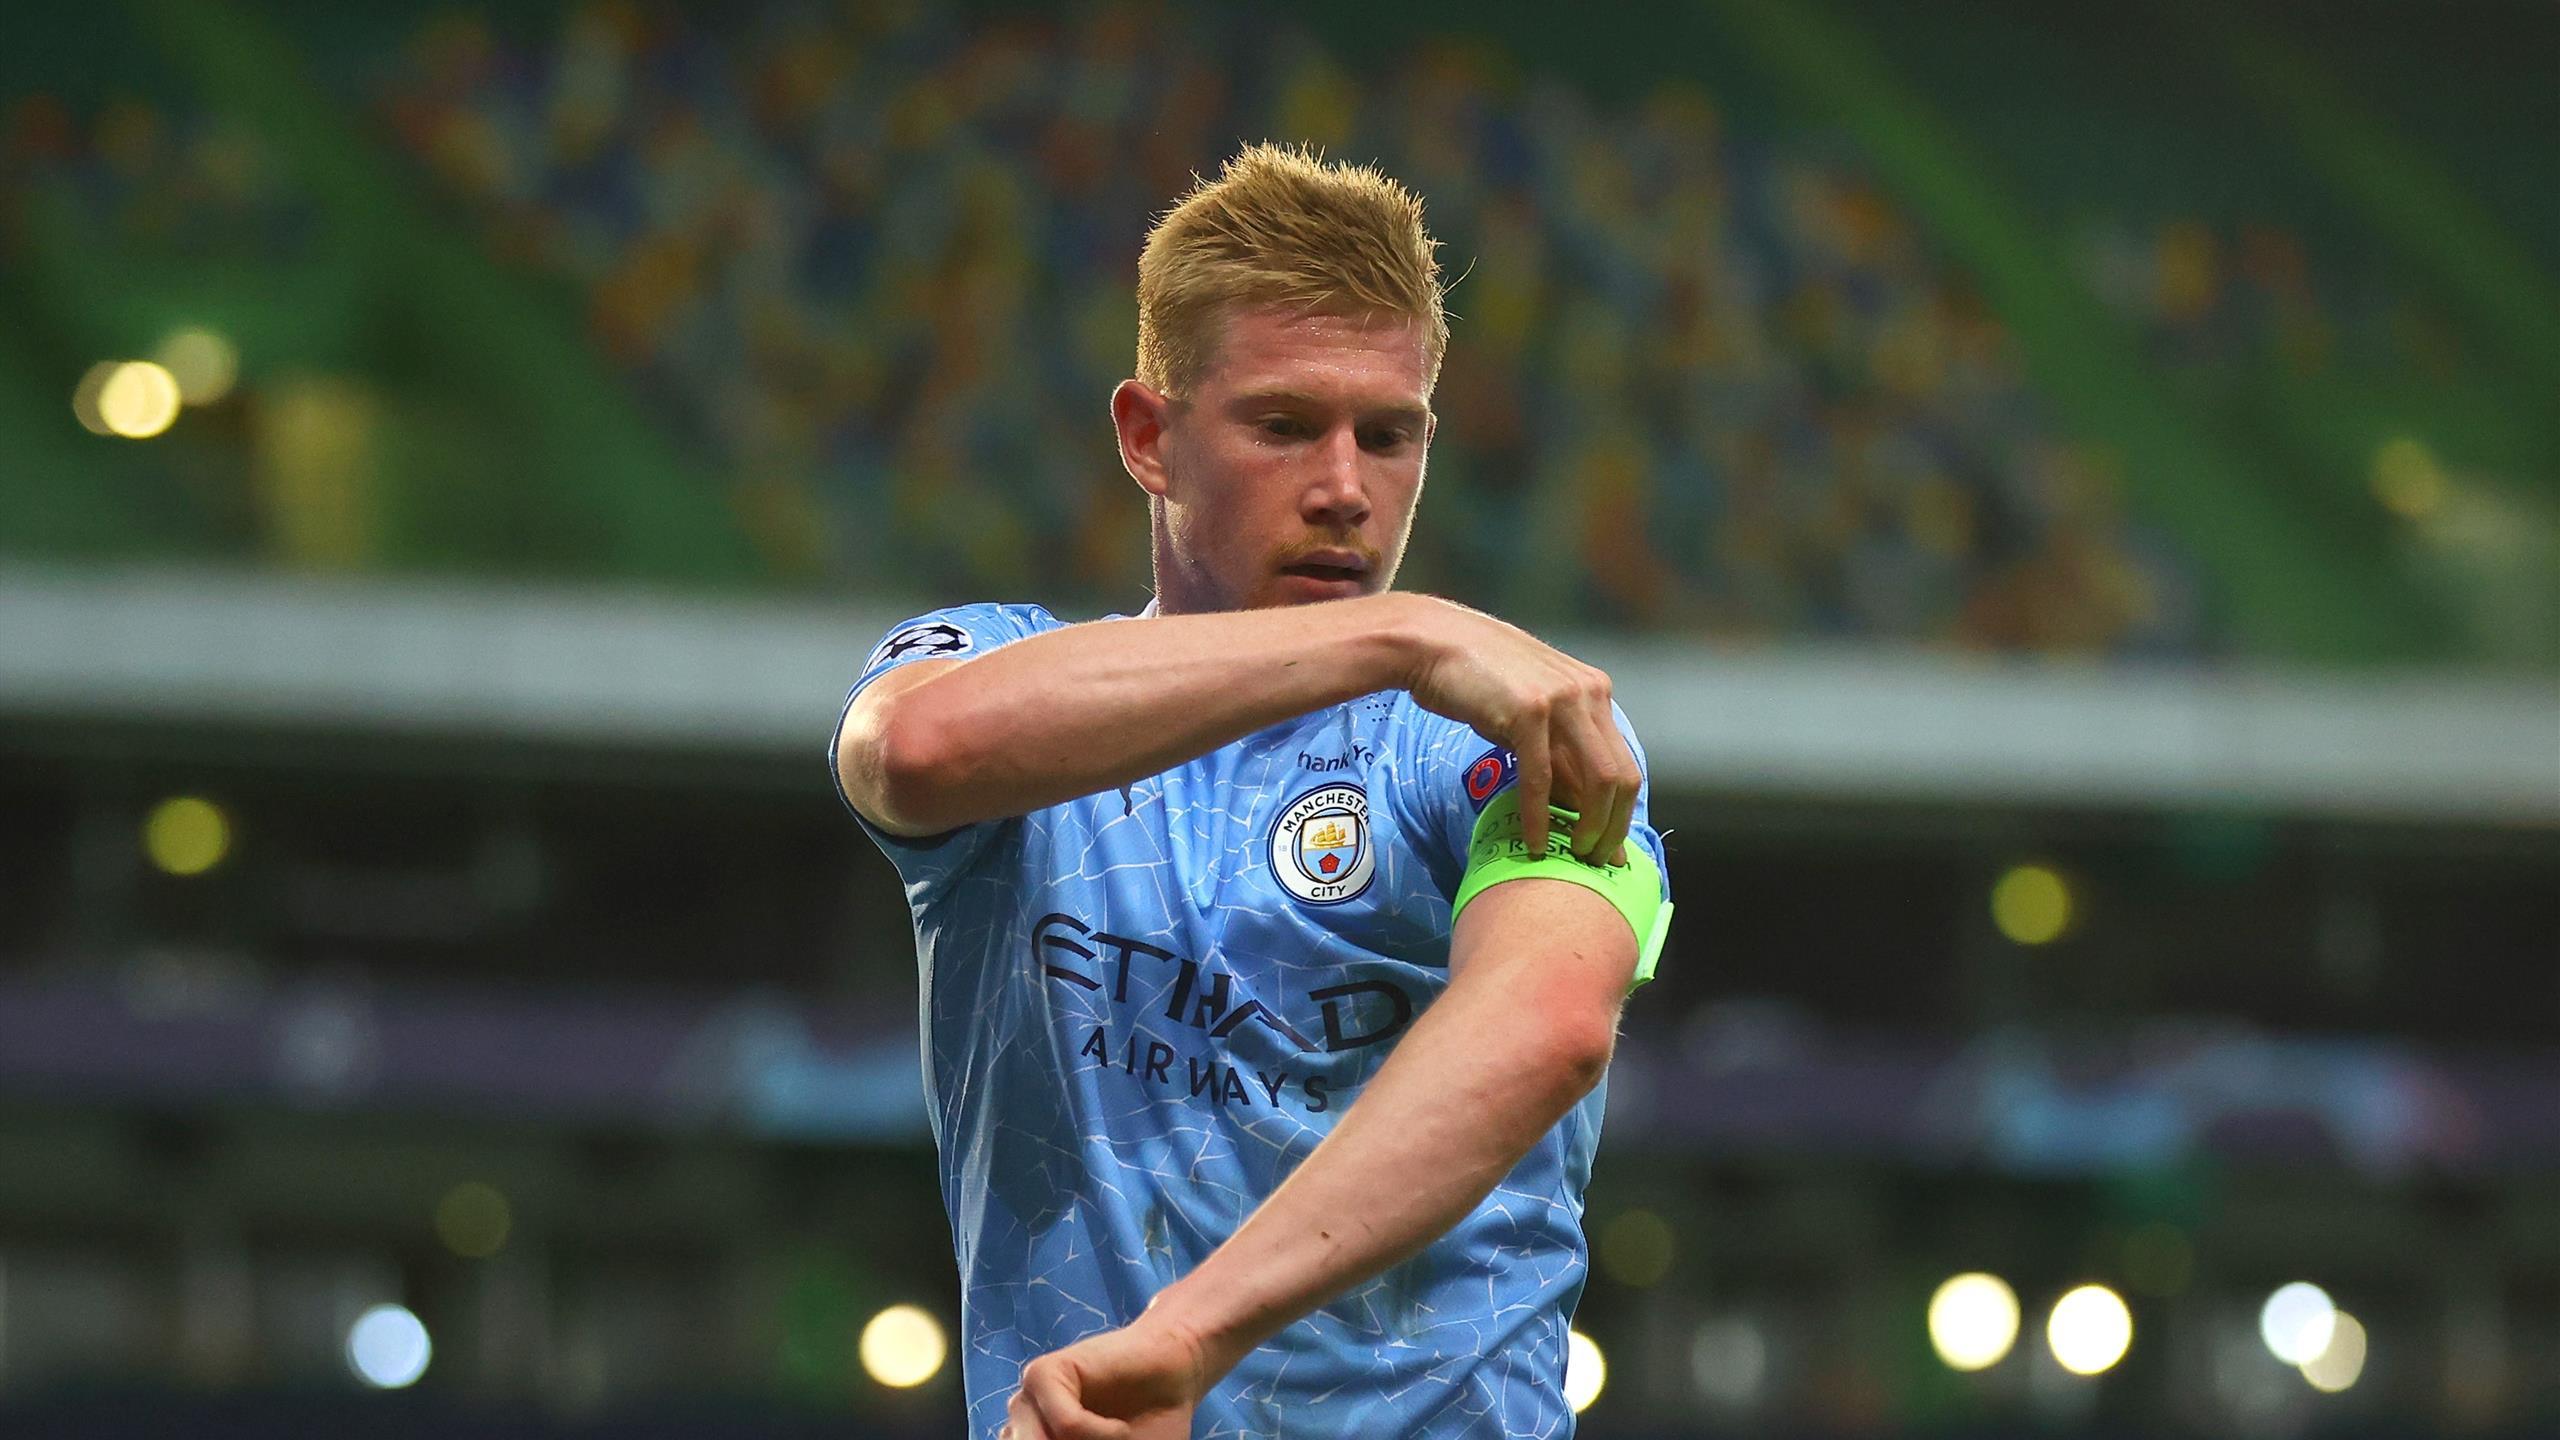 Kevin De Bruyne: 'It's a different year, same stuff' - Eurosport